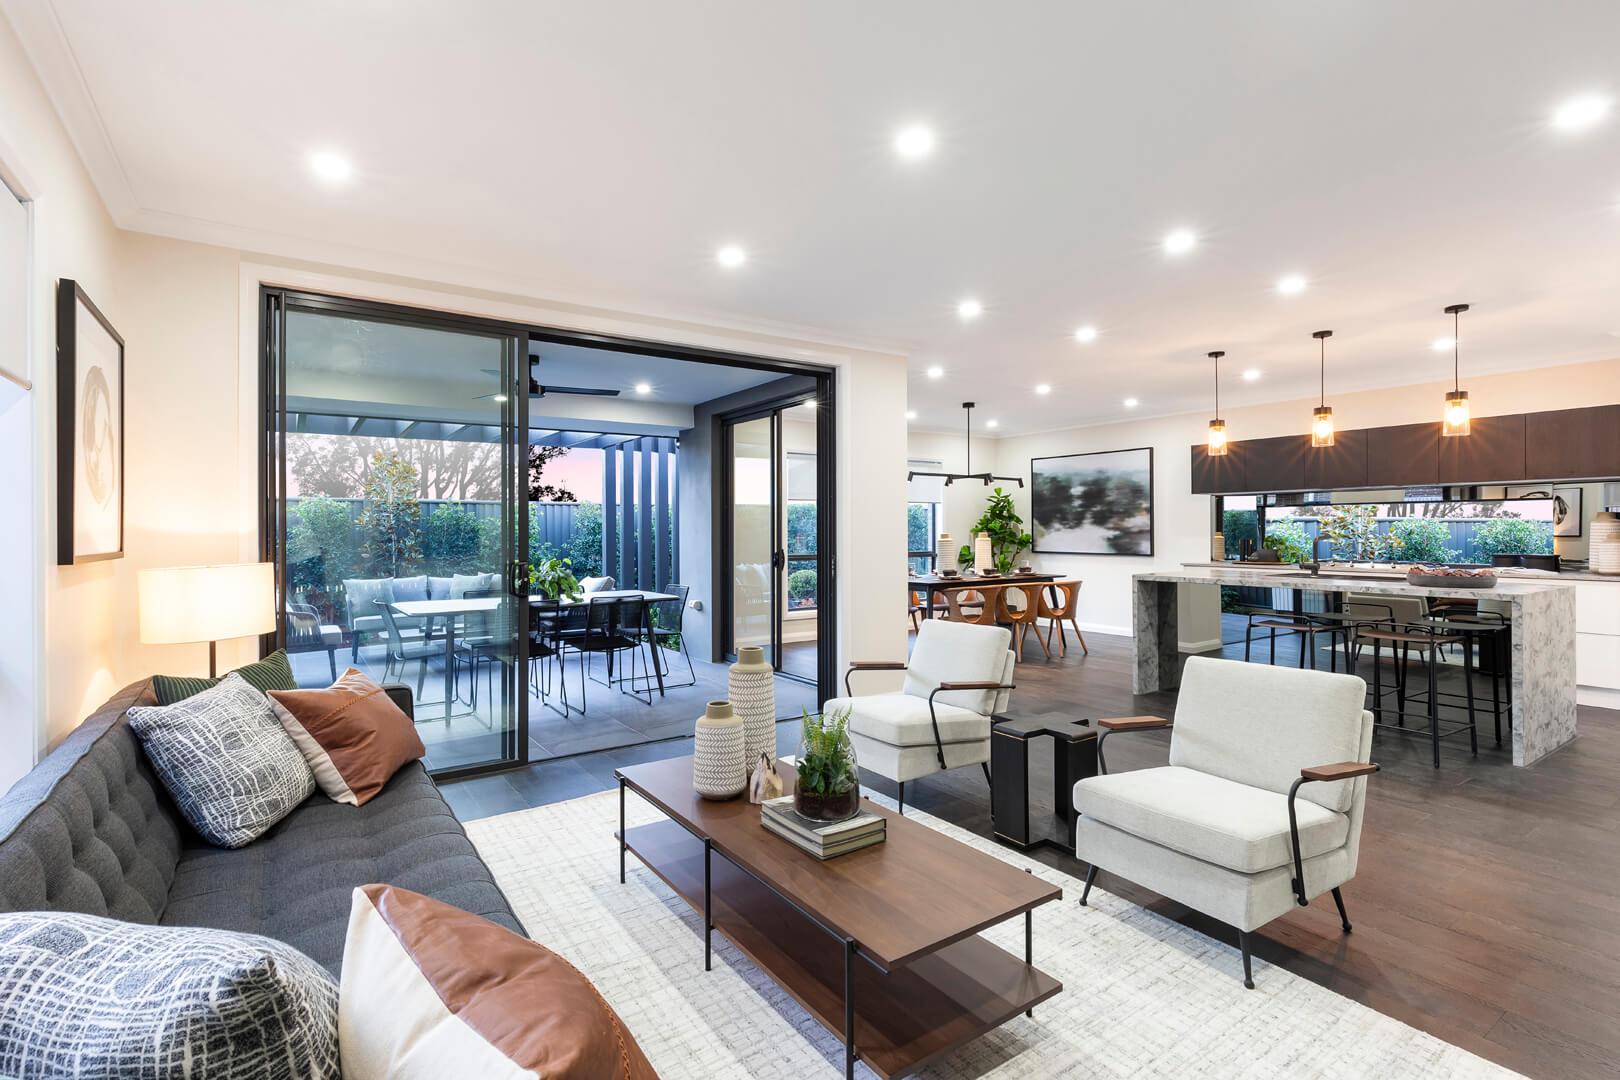 Bristol - Advantage | Eden Brae Homes